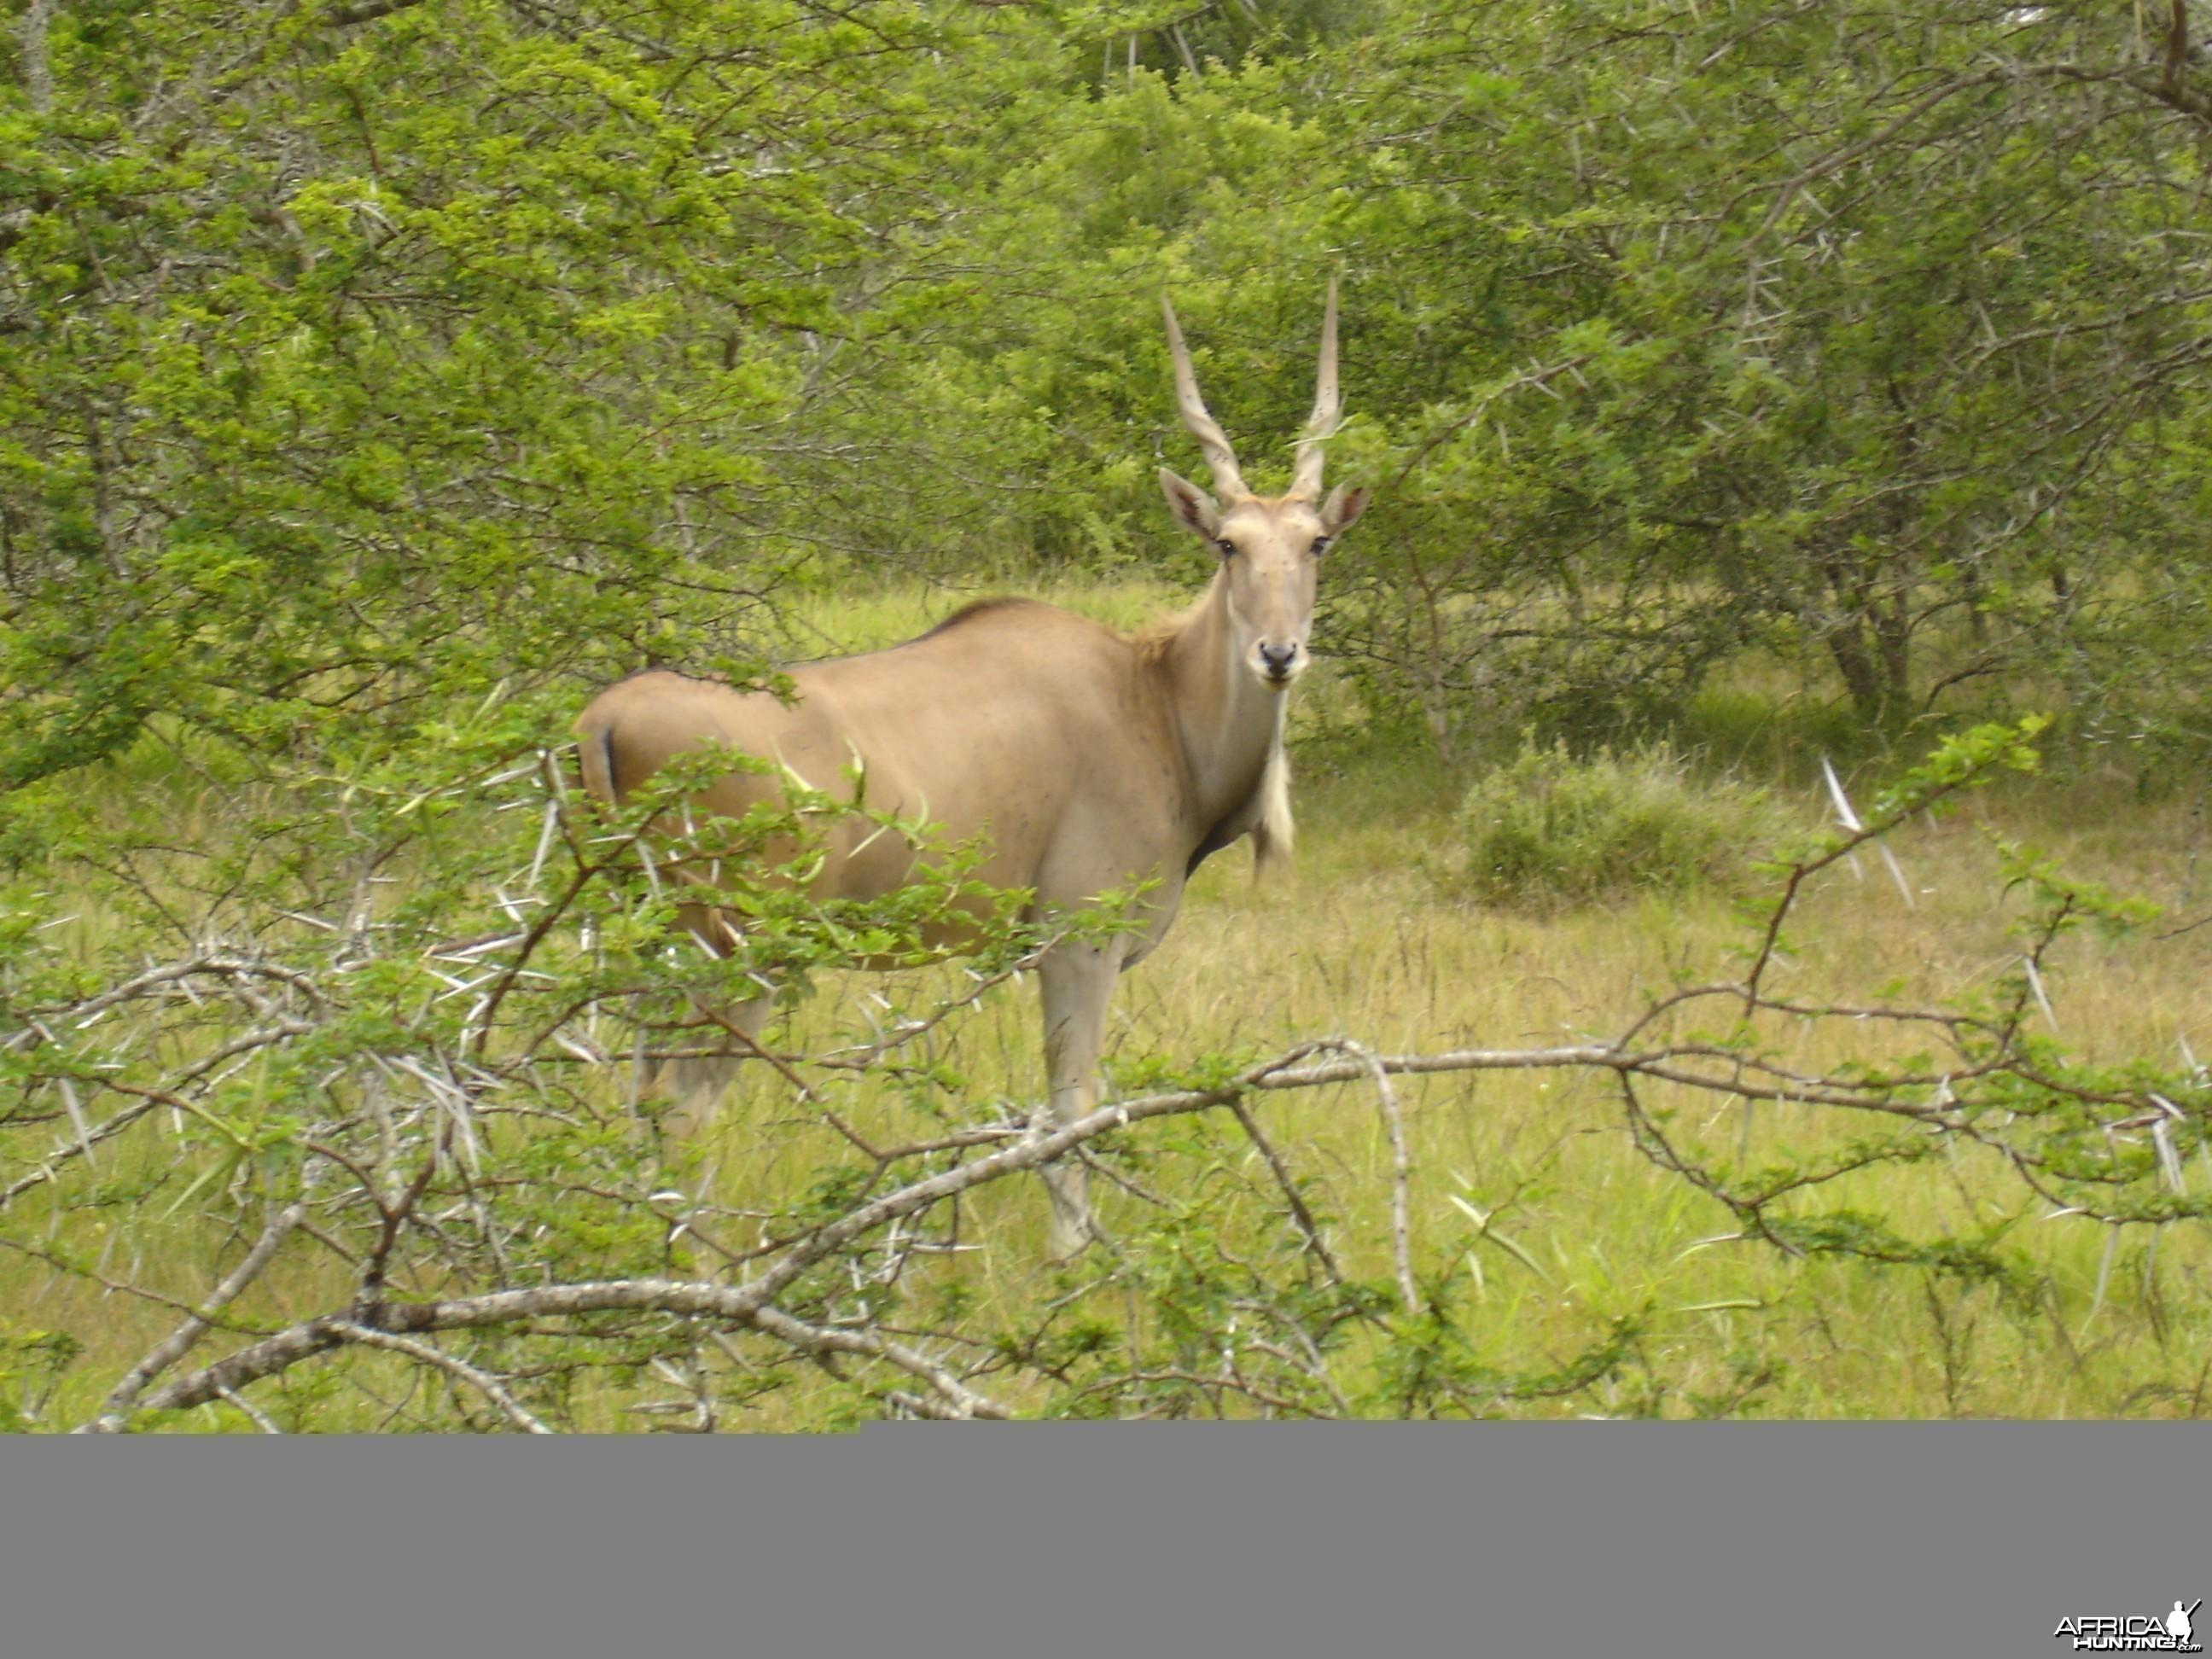 Young Eland Bull